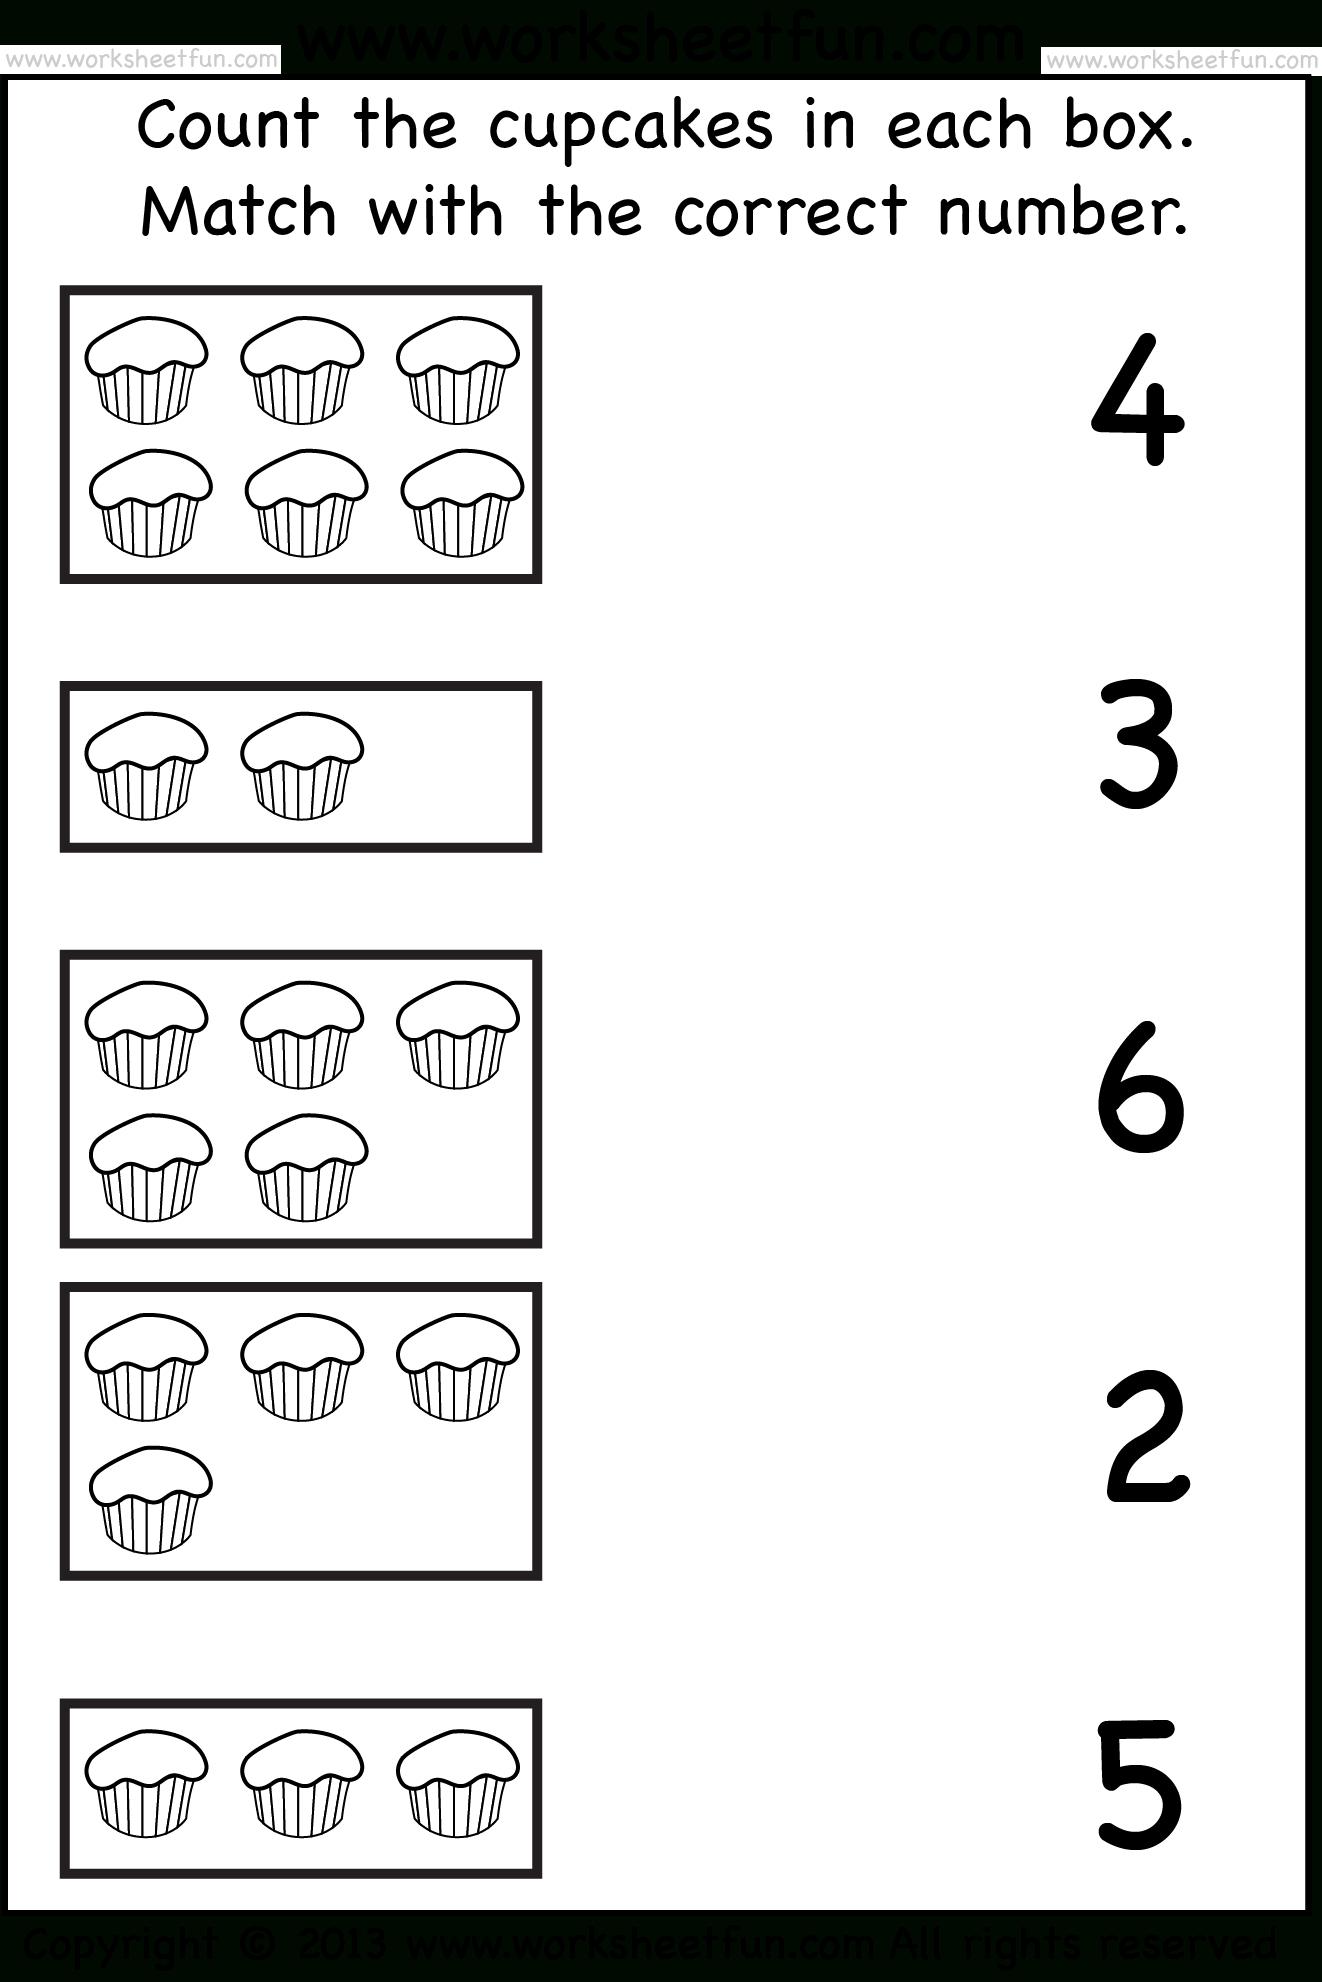 Tellen En Match_Cupcakes_Wfun_1   -Printables-   Free Kindergarten   Counting Printable Worksheets For Kindergarten